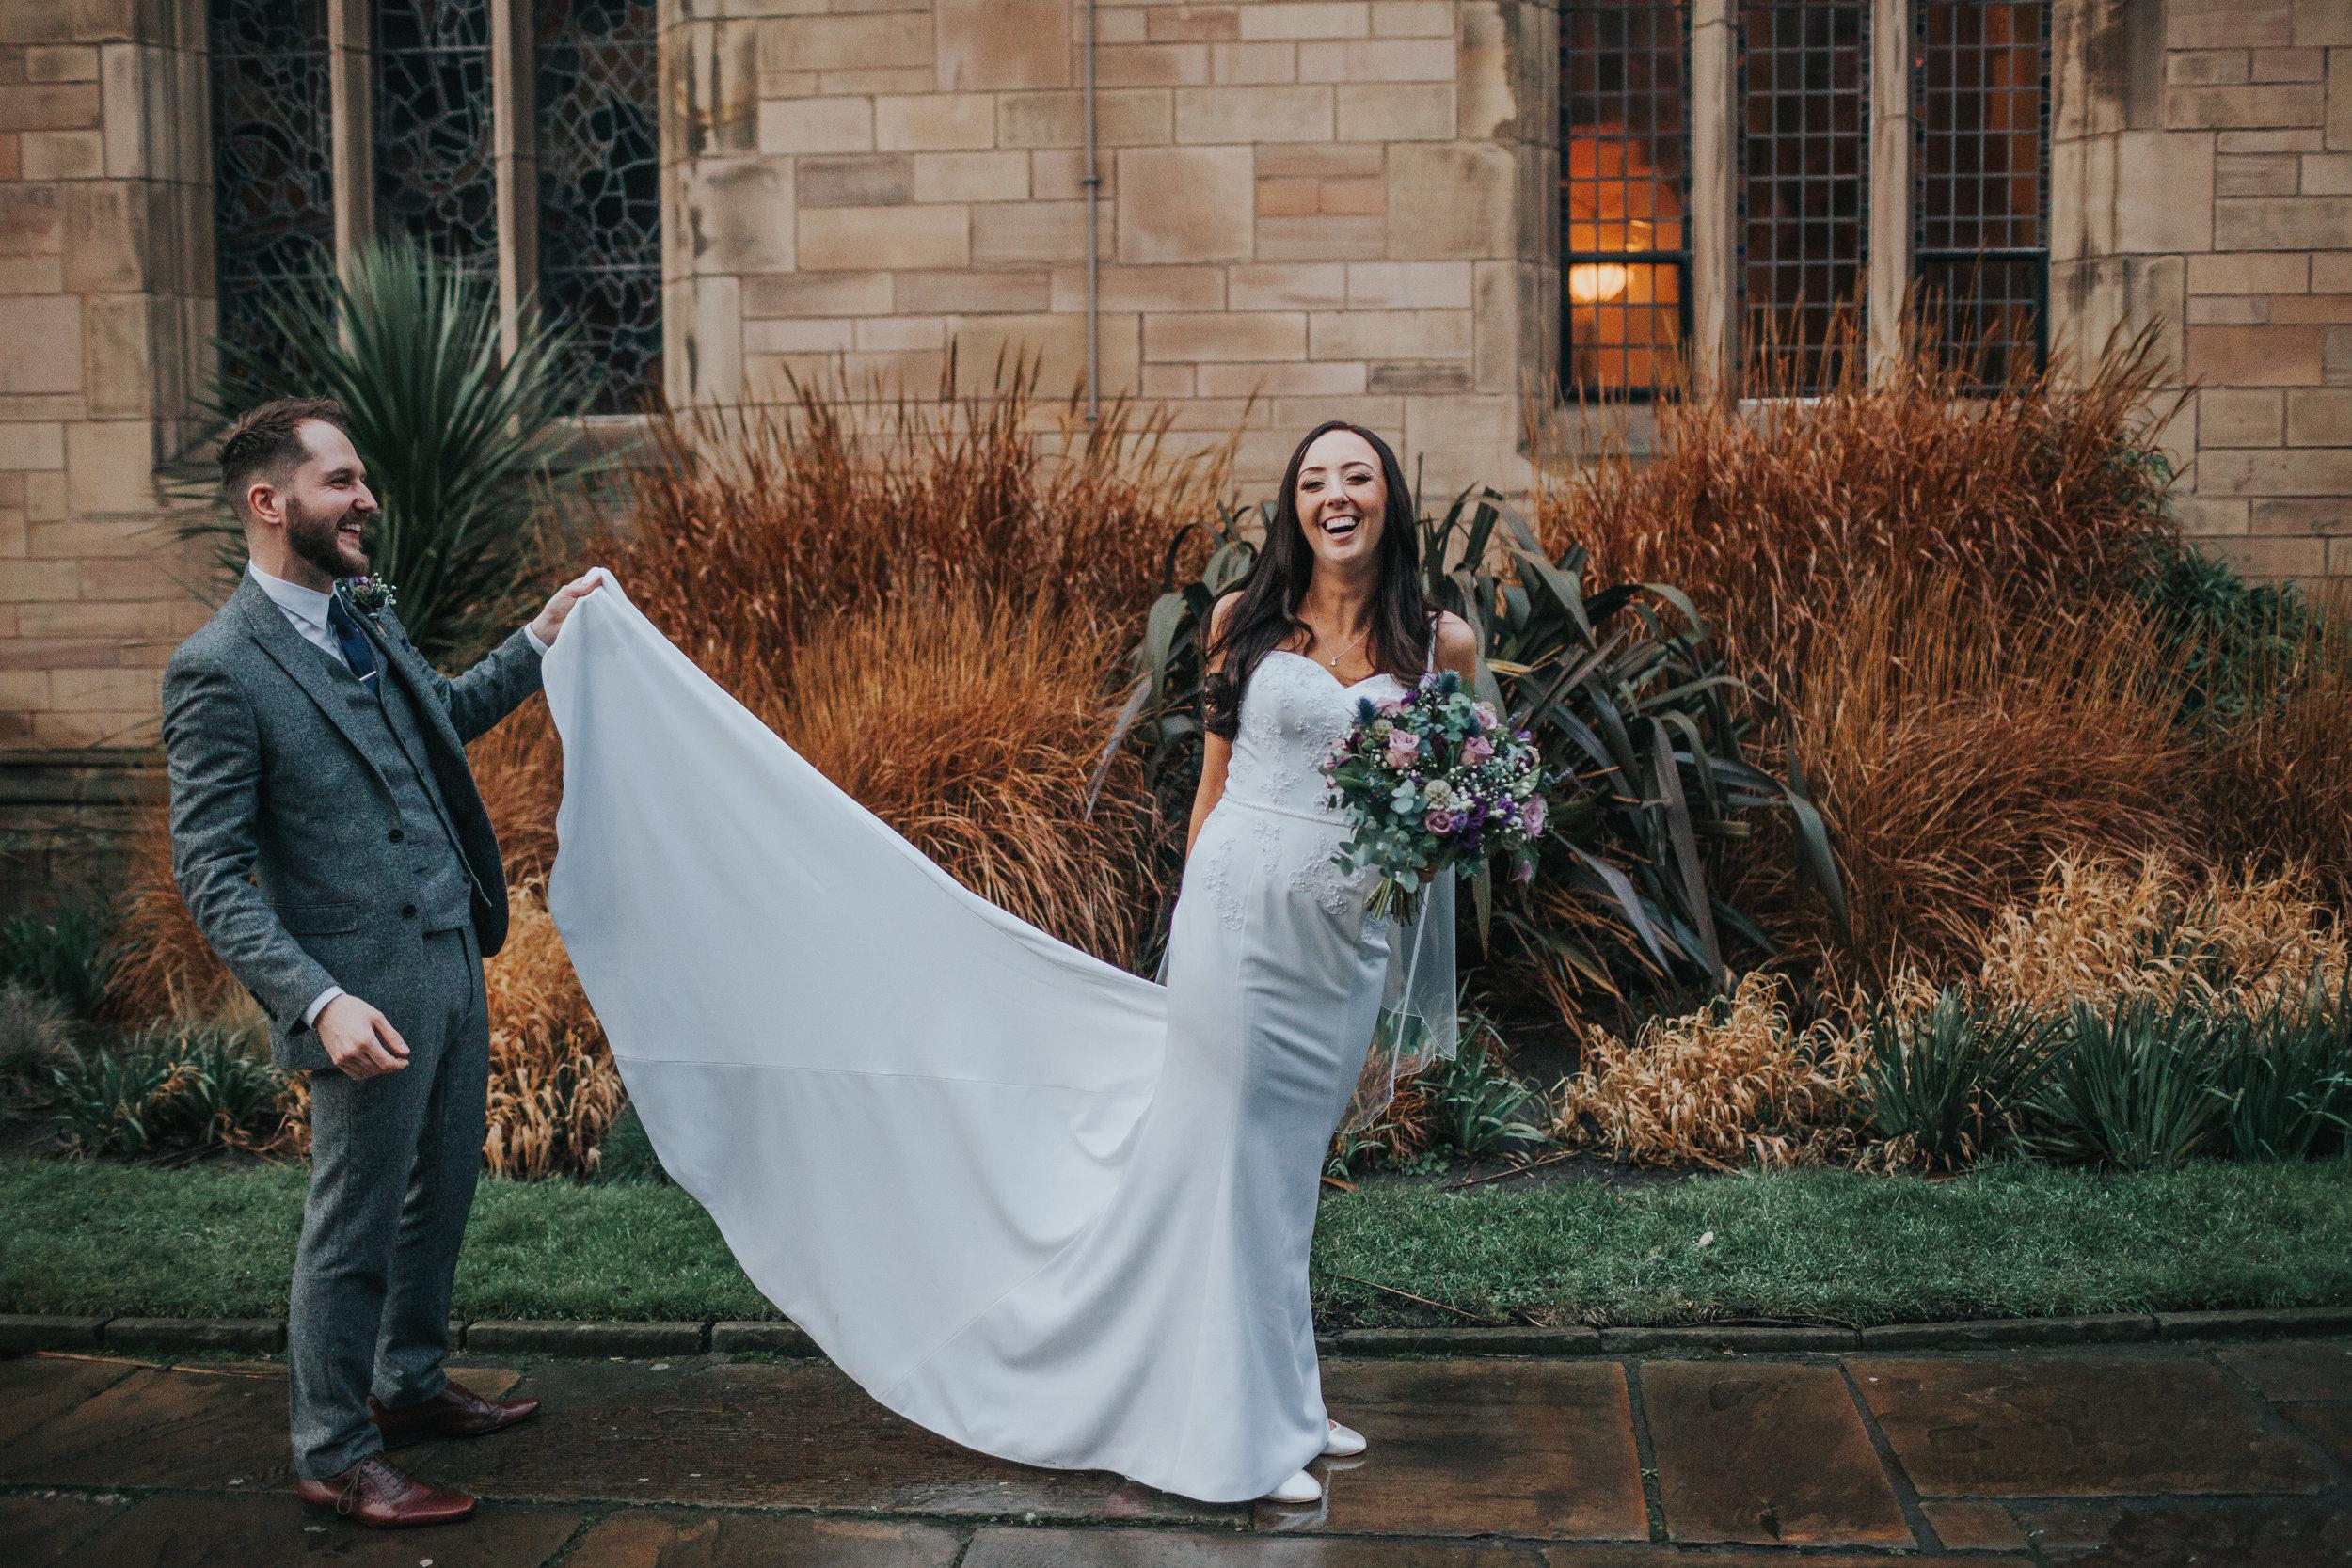 Bride laughs as groom fixes dress